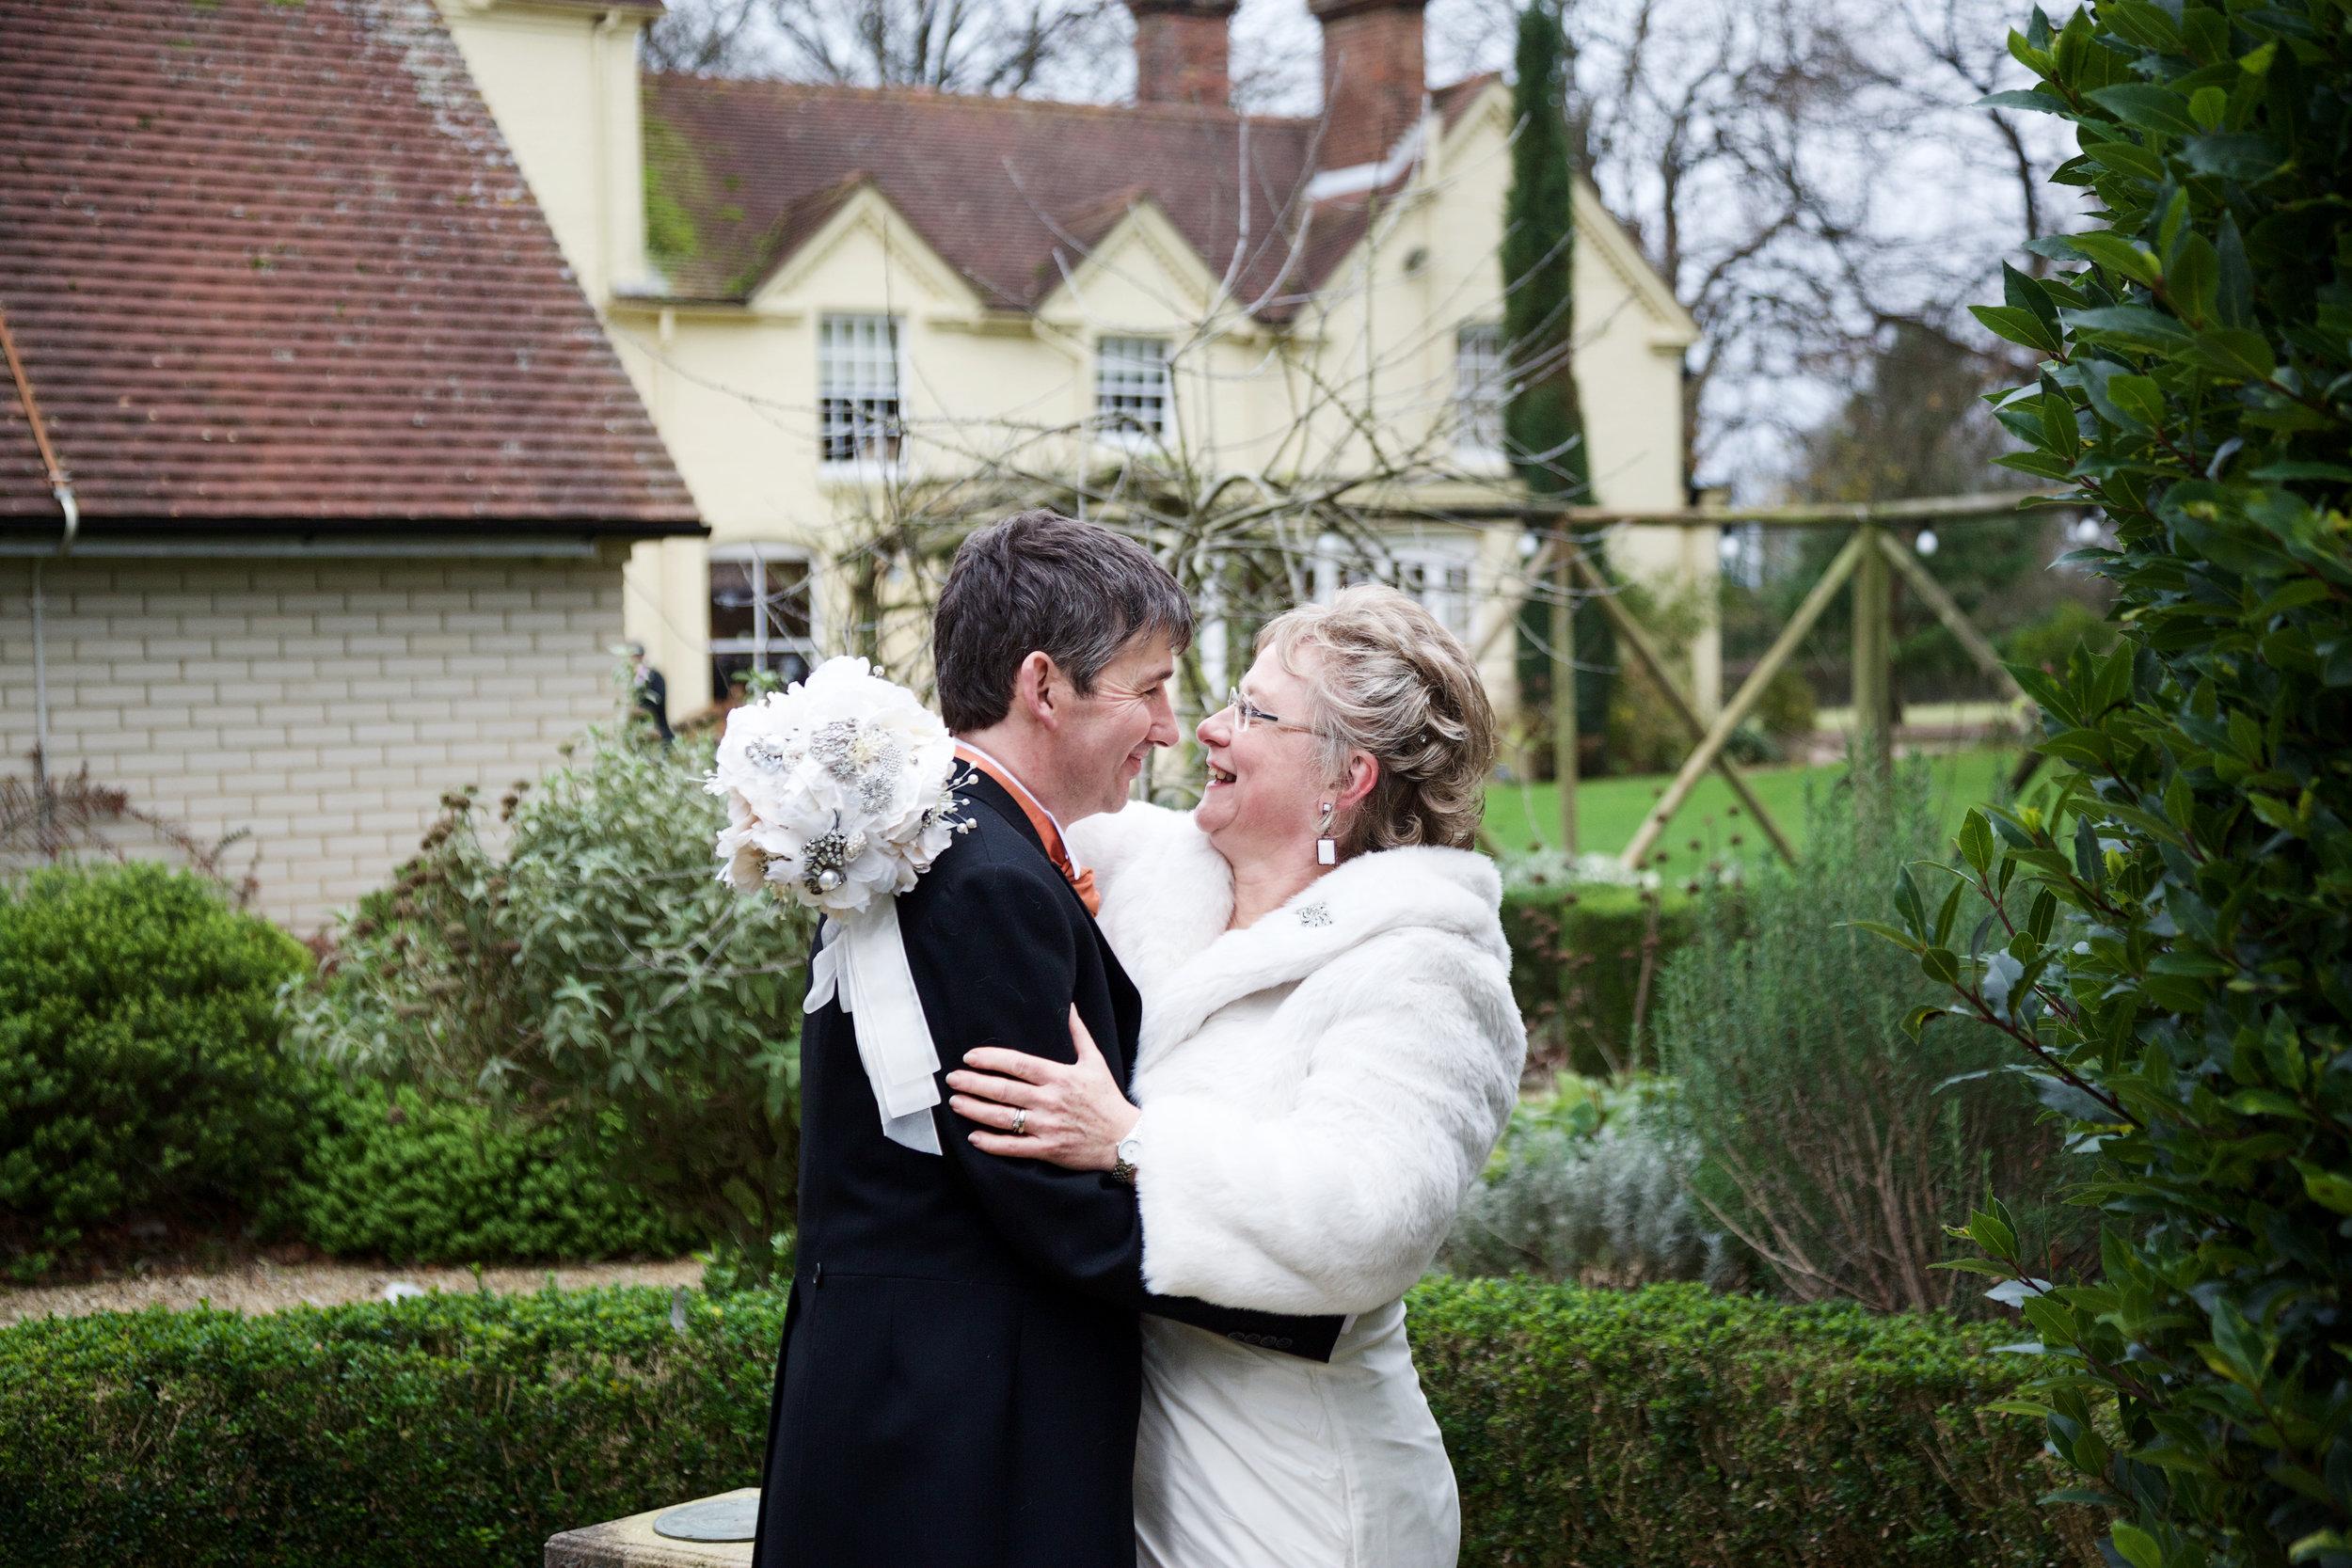 Esseborne_Manor_Wedding_Photographer_Andover_027.jpg